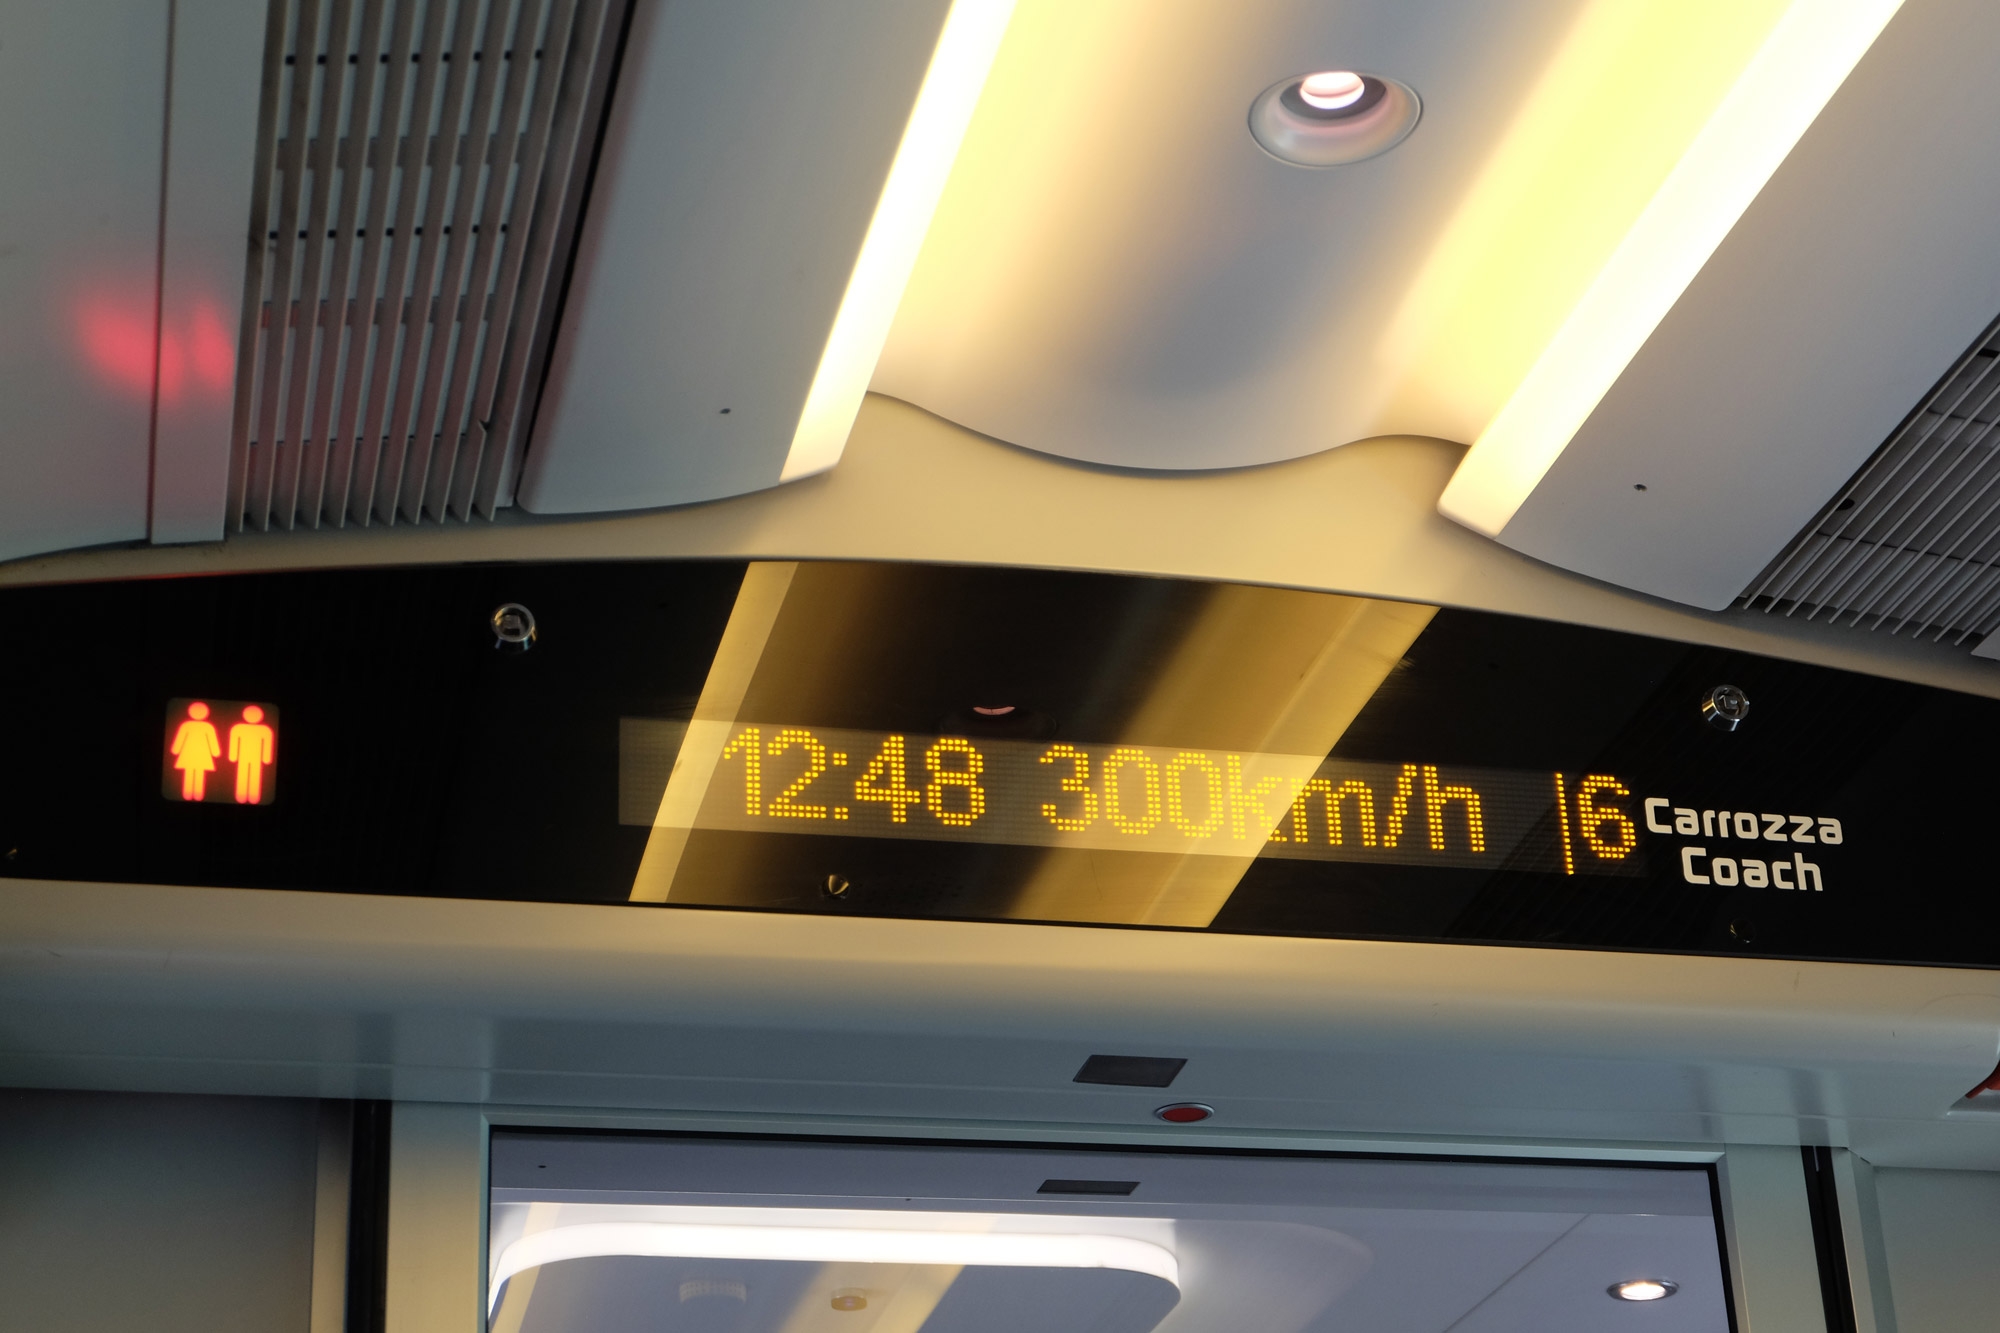 300km/h on the Ferrari train!